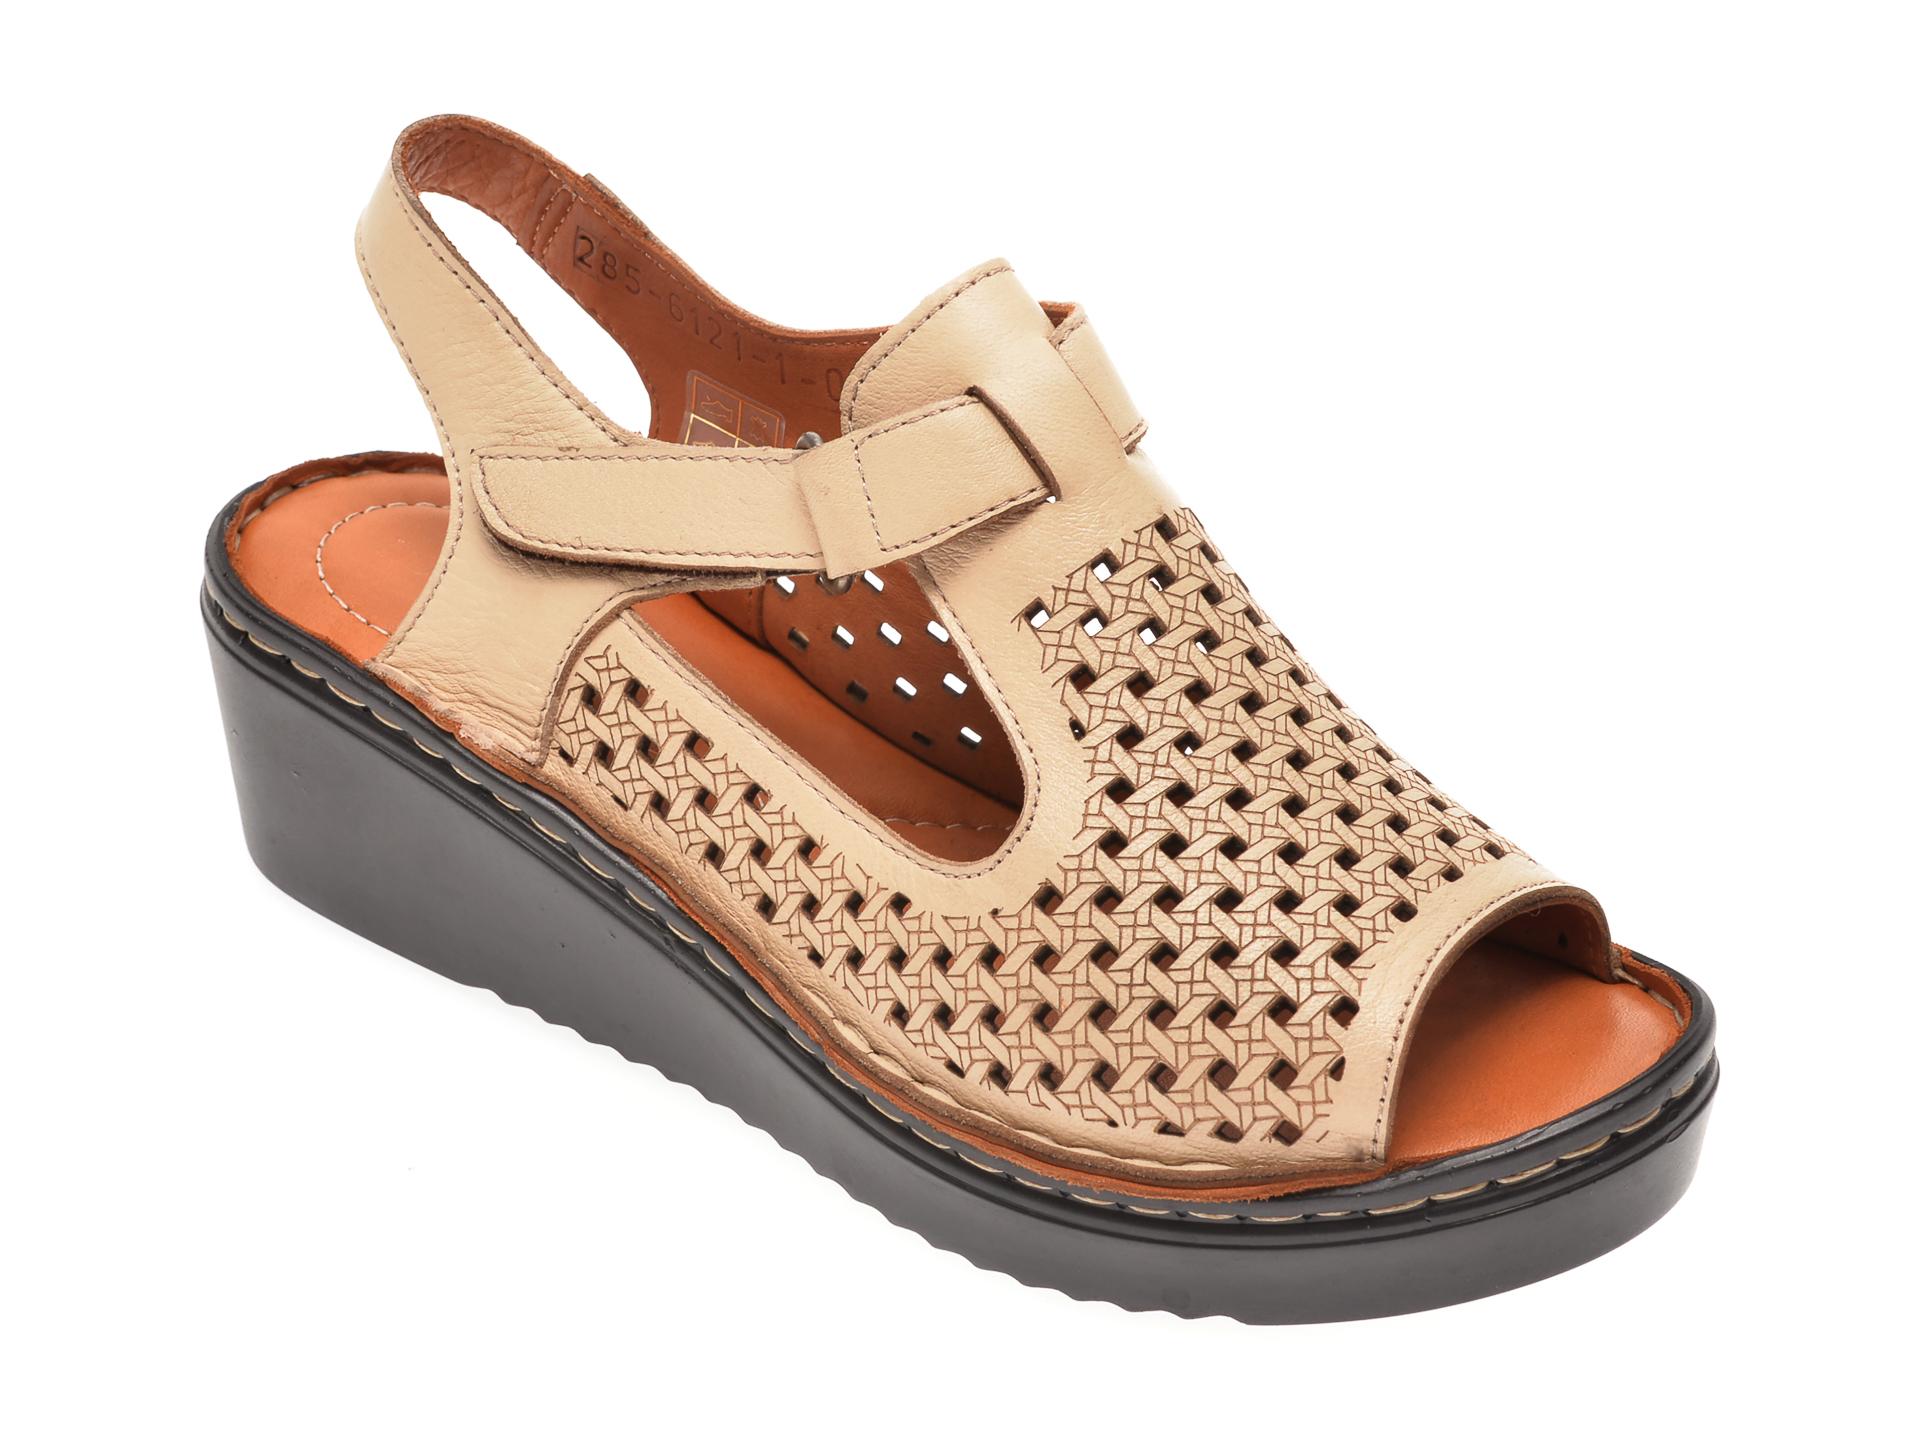 Sandale FLAVIA PASSINI bej, 61211, din piele naturala